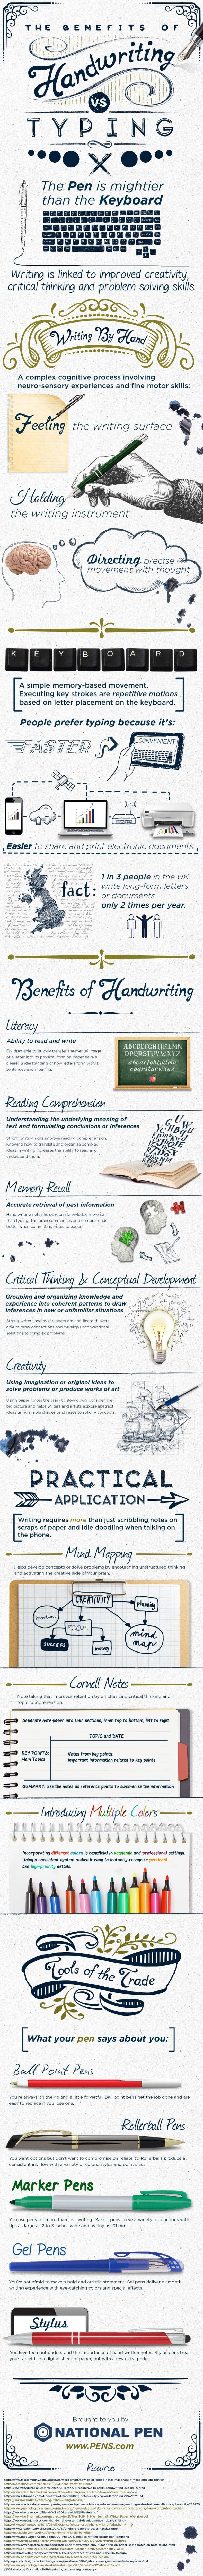 Manfaat Tulisan Tangan vs Pen ikan